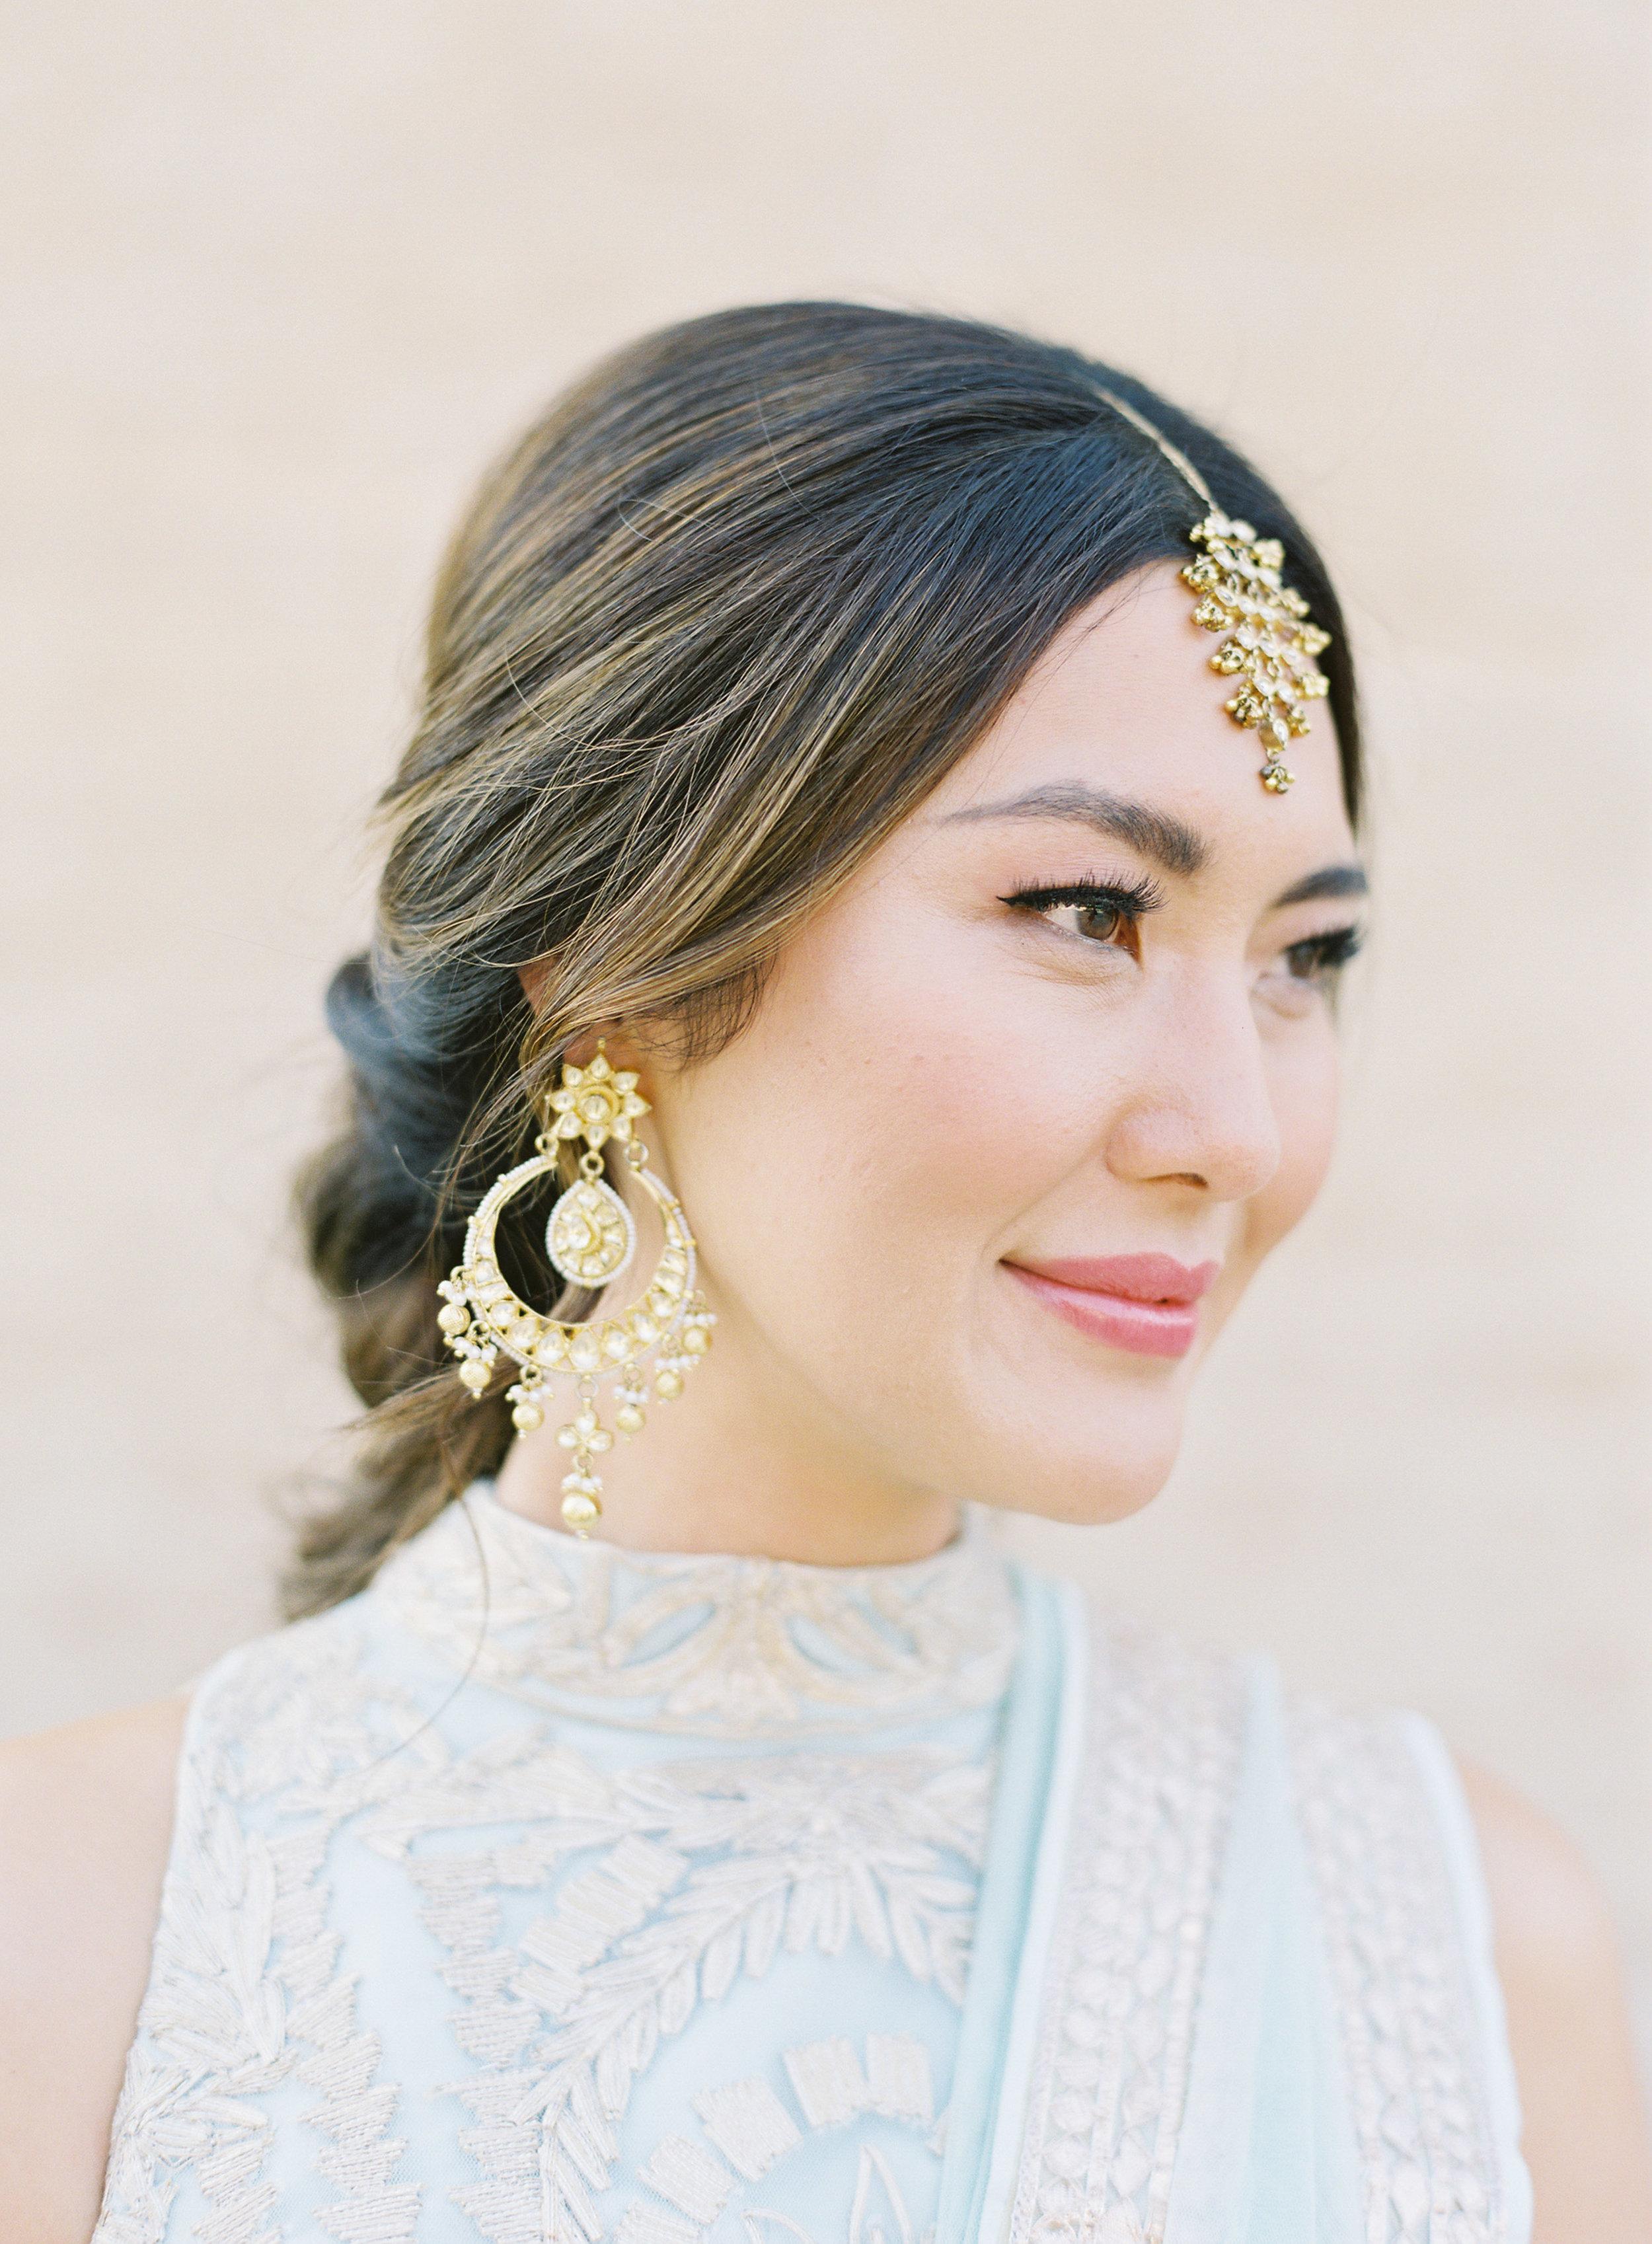 KS-Sangeet-Editorial-60-Jen-Huang-KS-Sangeet-70-Jen-Huang-006924-R3-003.jpg